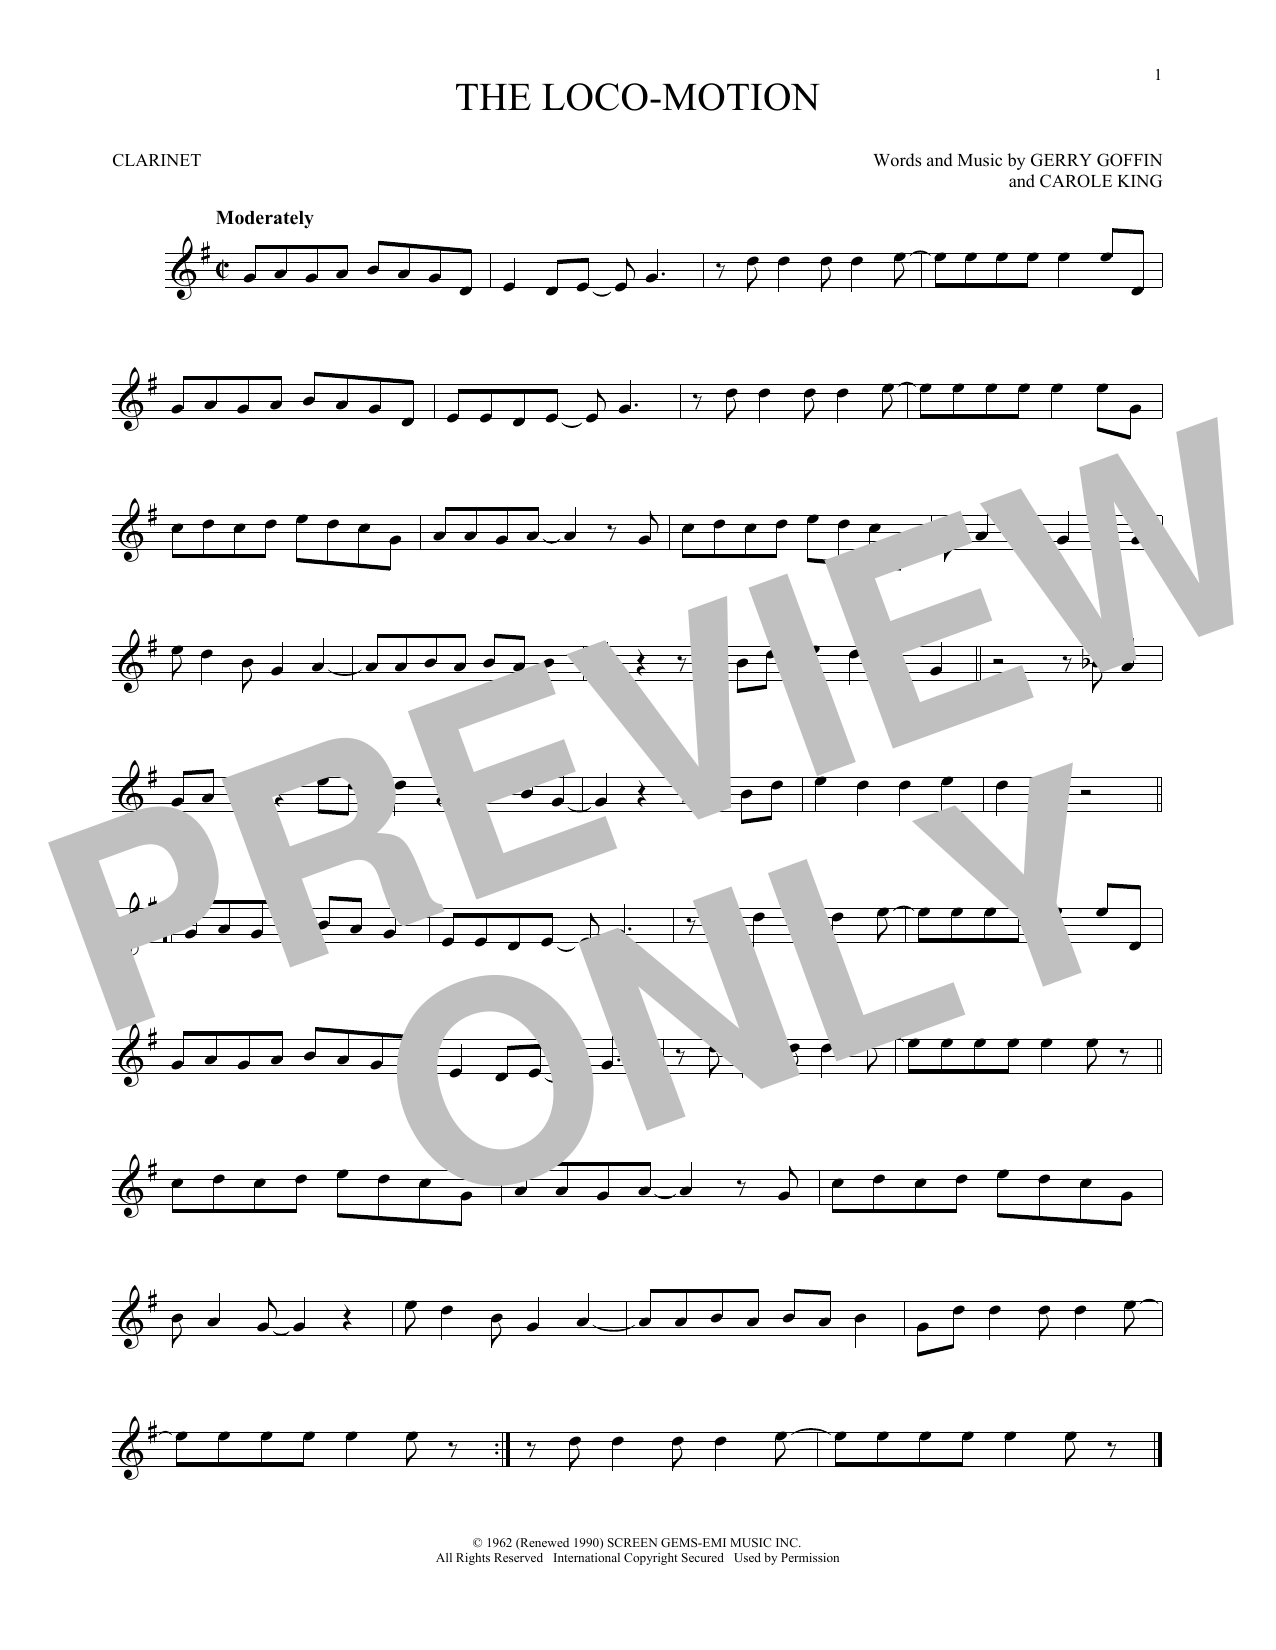 The Loco-Motion (Clarinet Solo)